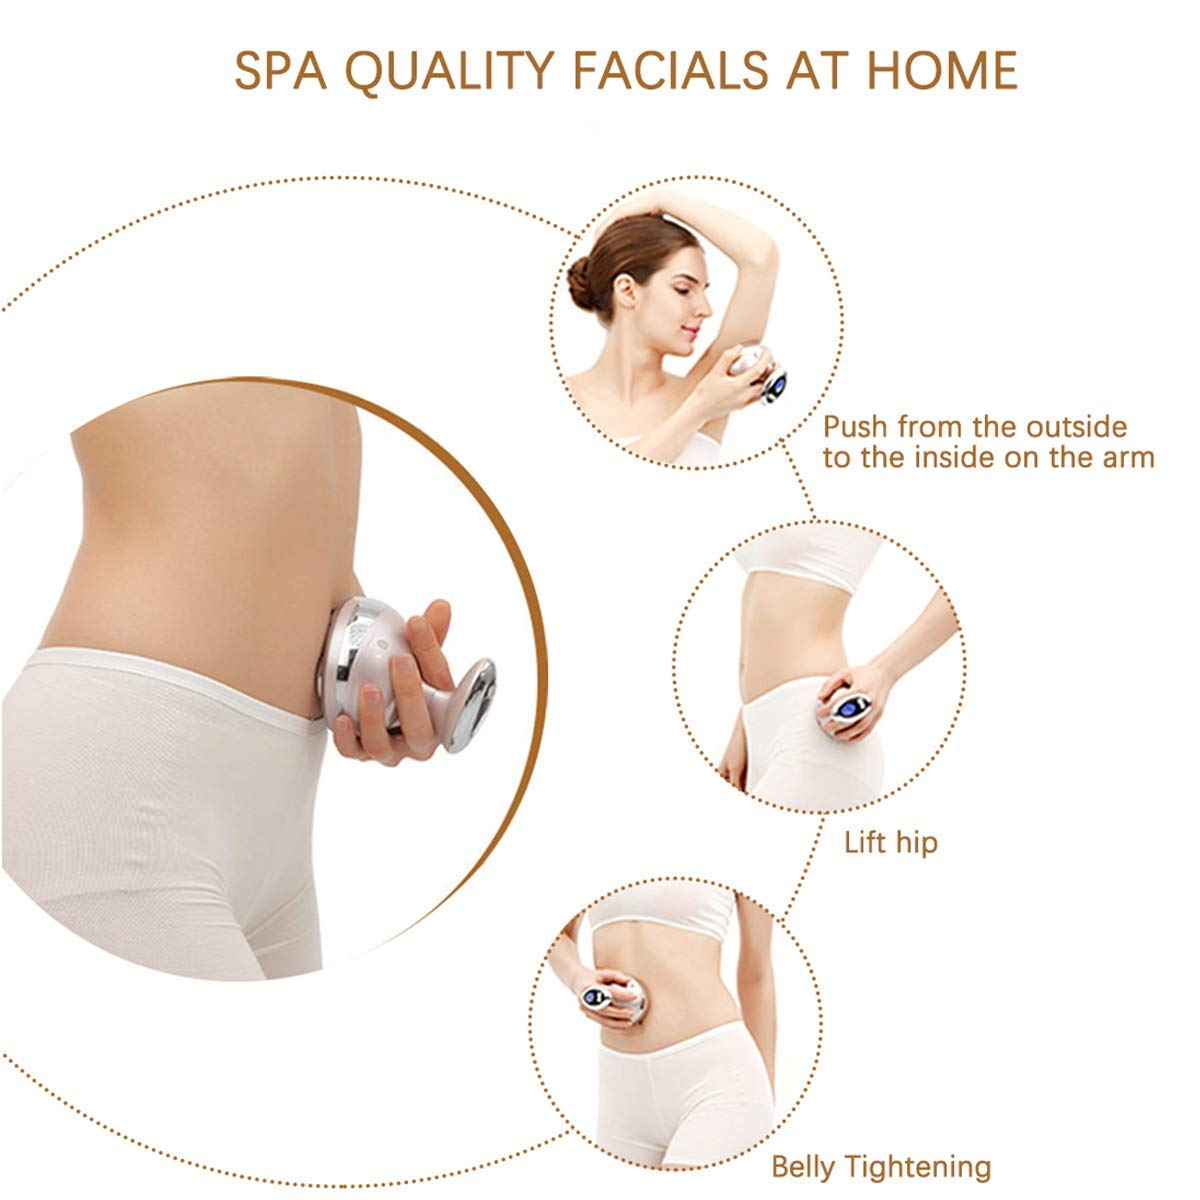 YOGAA Dispositif Corps tonifiant bruleur ultrasons Galvanic Fat Massage Anti-Cellulite Tummy Machine Ventre Perte Poids avec Red Light pour Corps Cavitation Jambe Cuisse